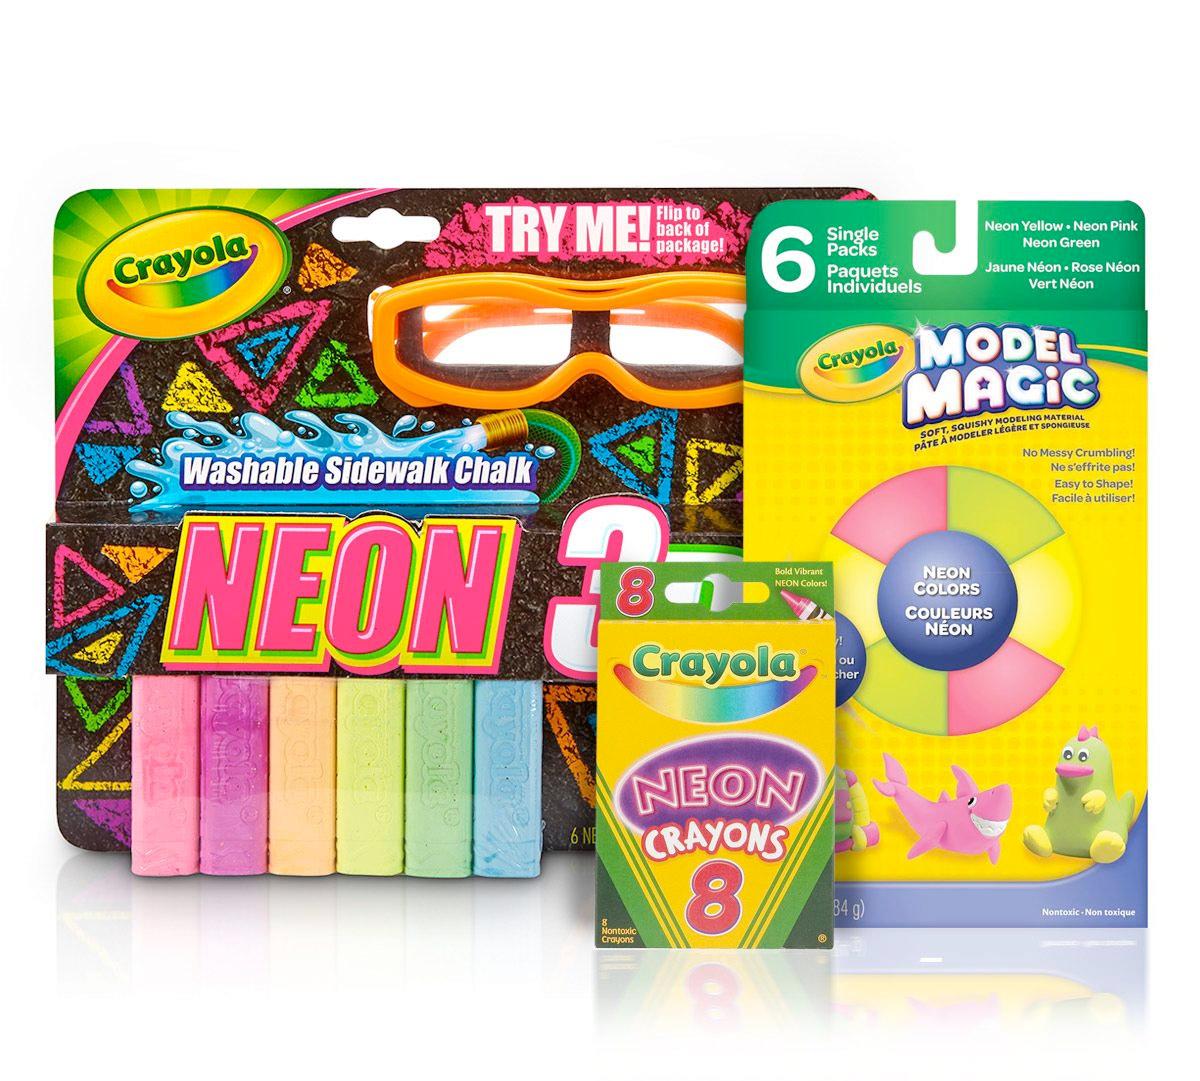 Easter gift guide crayola crayola easter basket stuffers neon art supplies negle Gallery